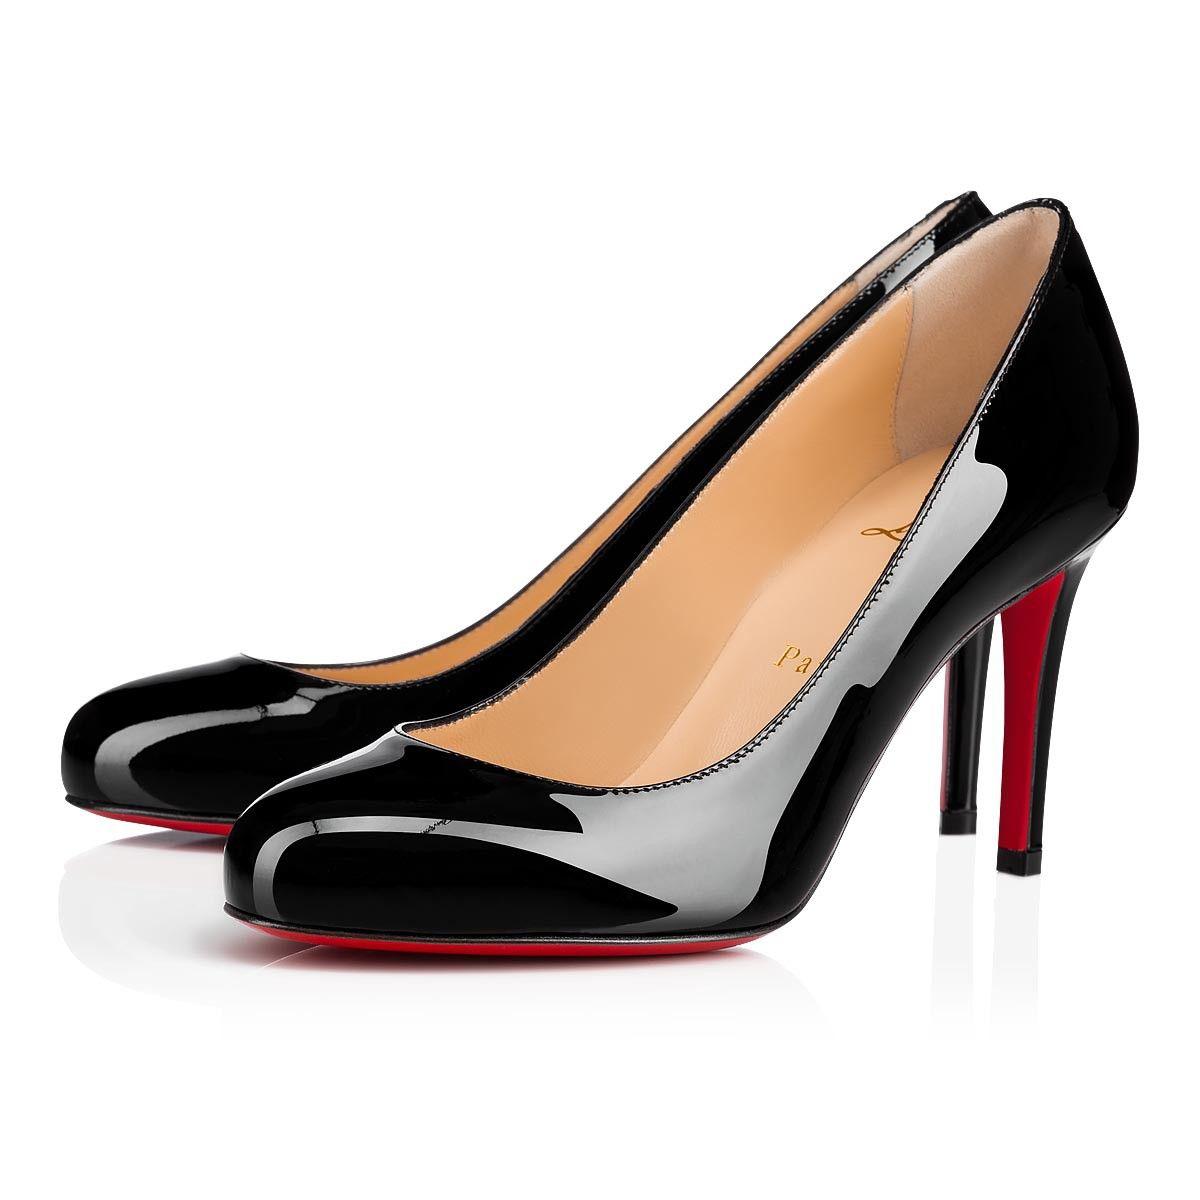 8eeeba58c1fb Christian Loubou en ligne Women Shoes Pigalle Follies 85 Nomade Suede